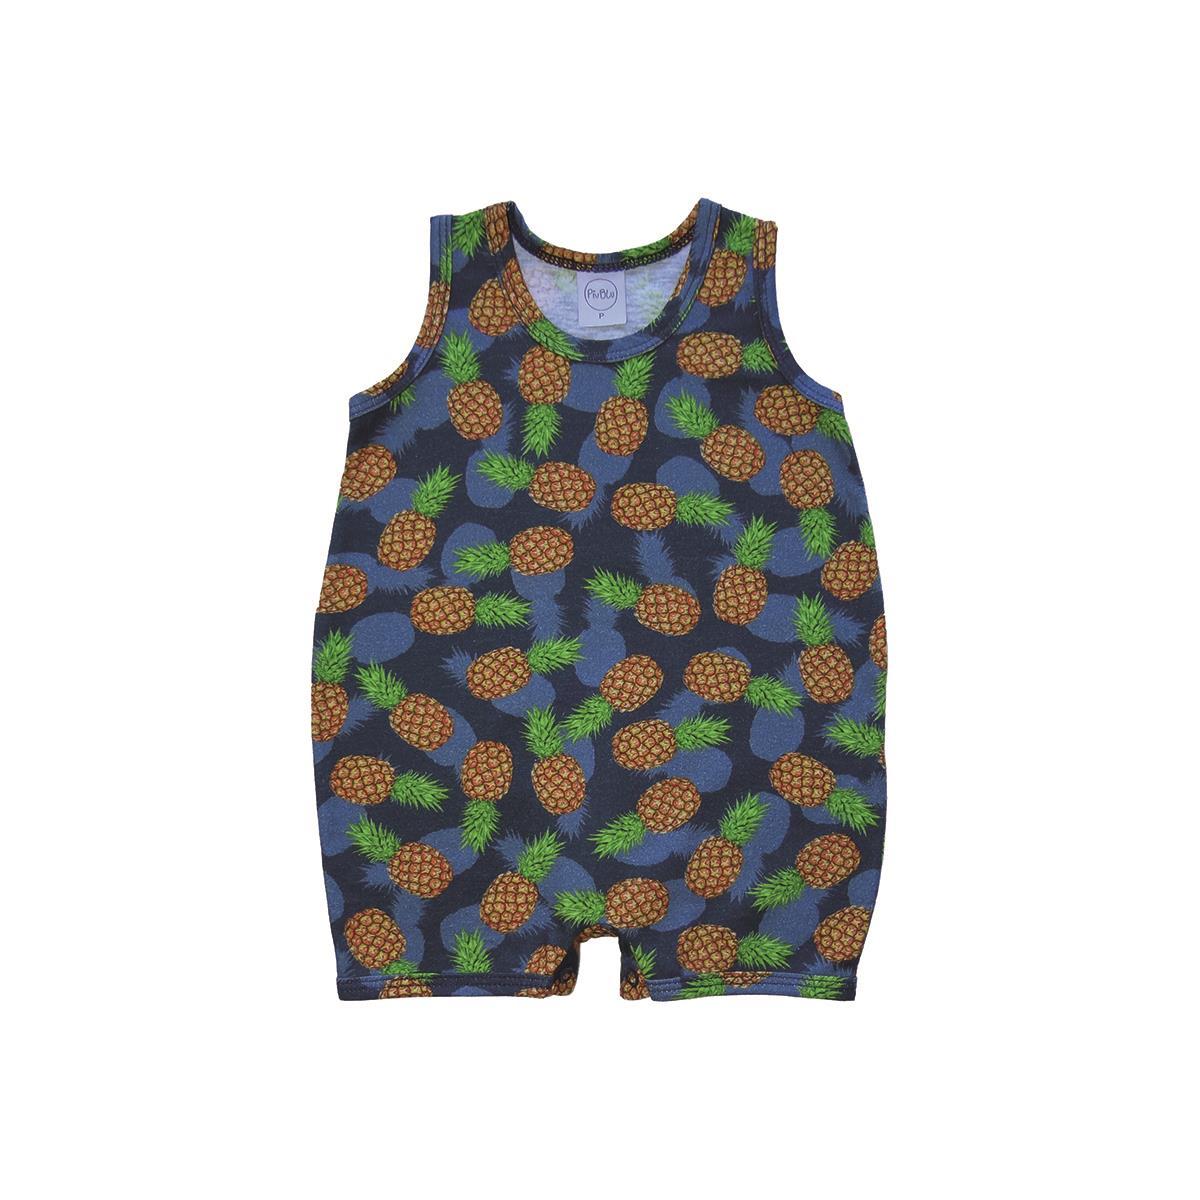 Macacão Bebê M Malha Abacaxis  - Piu Blu